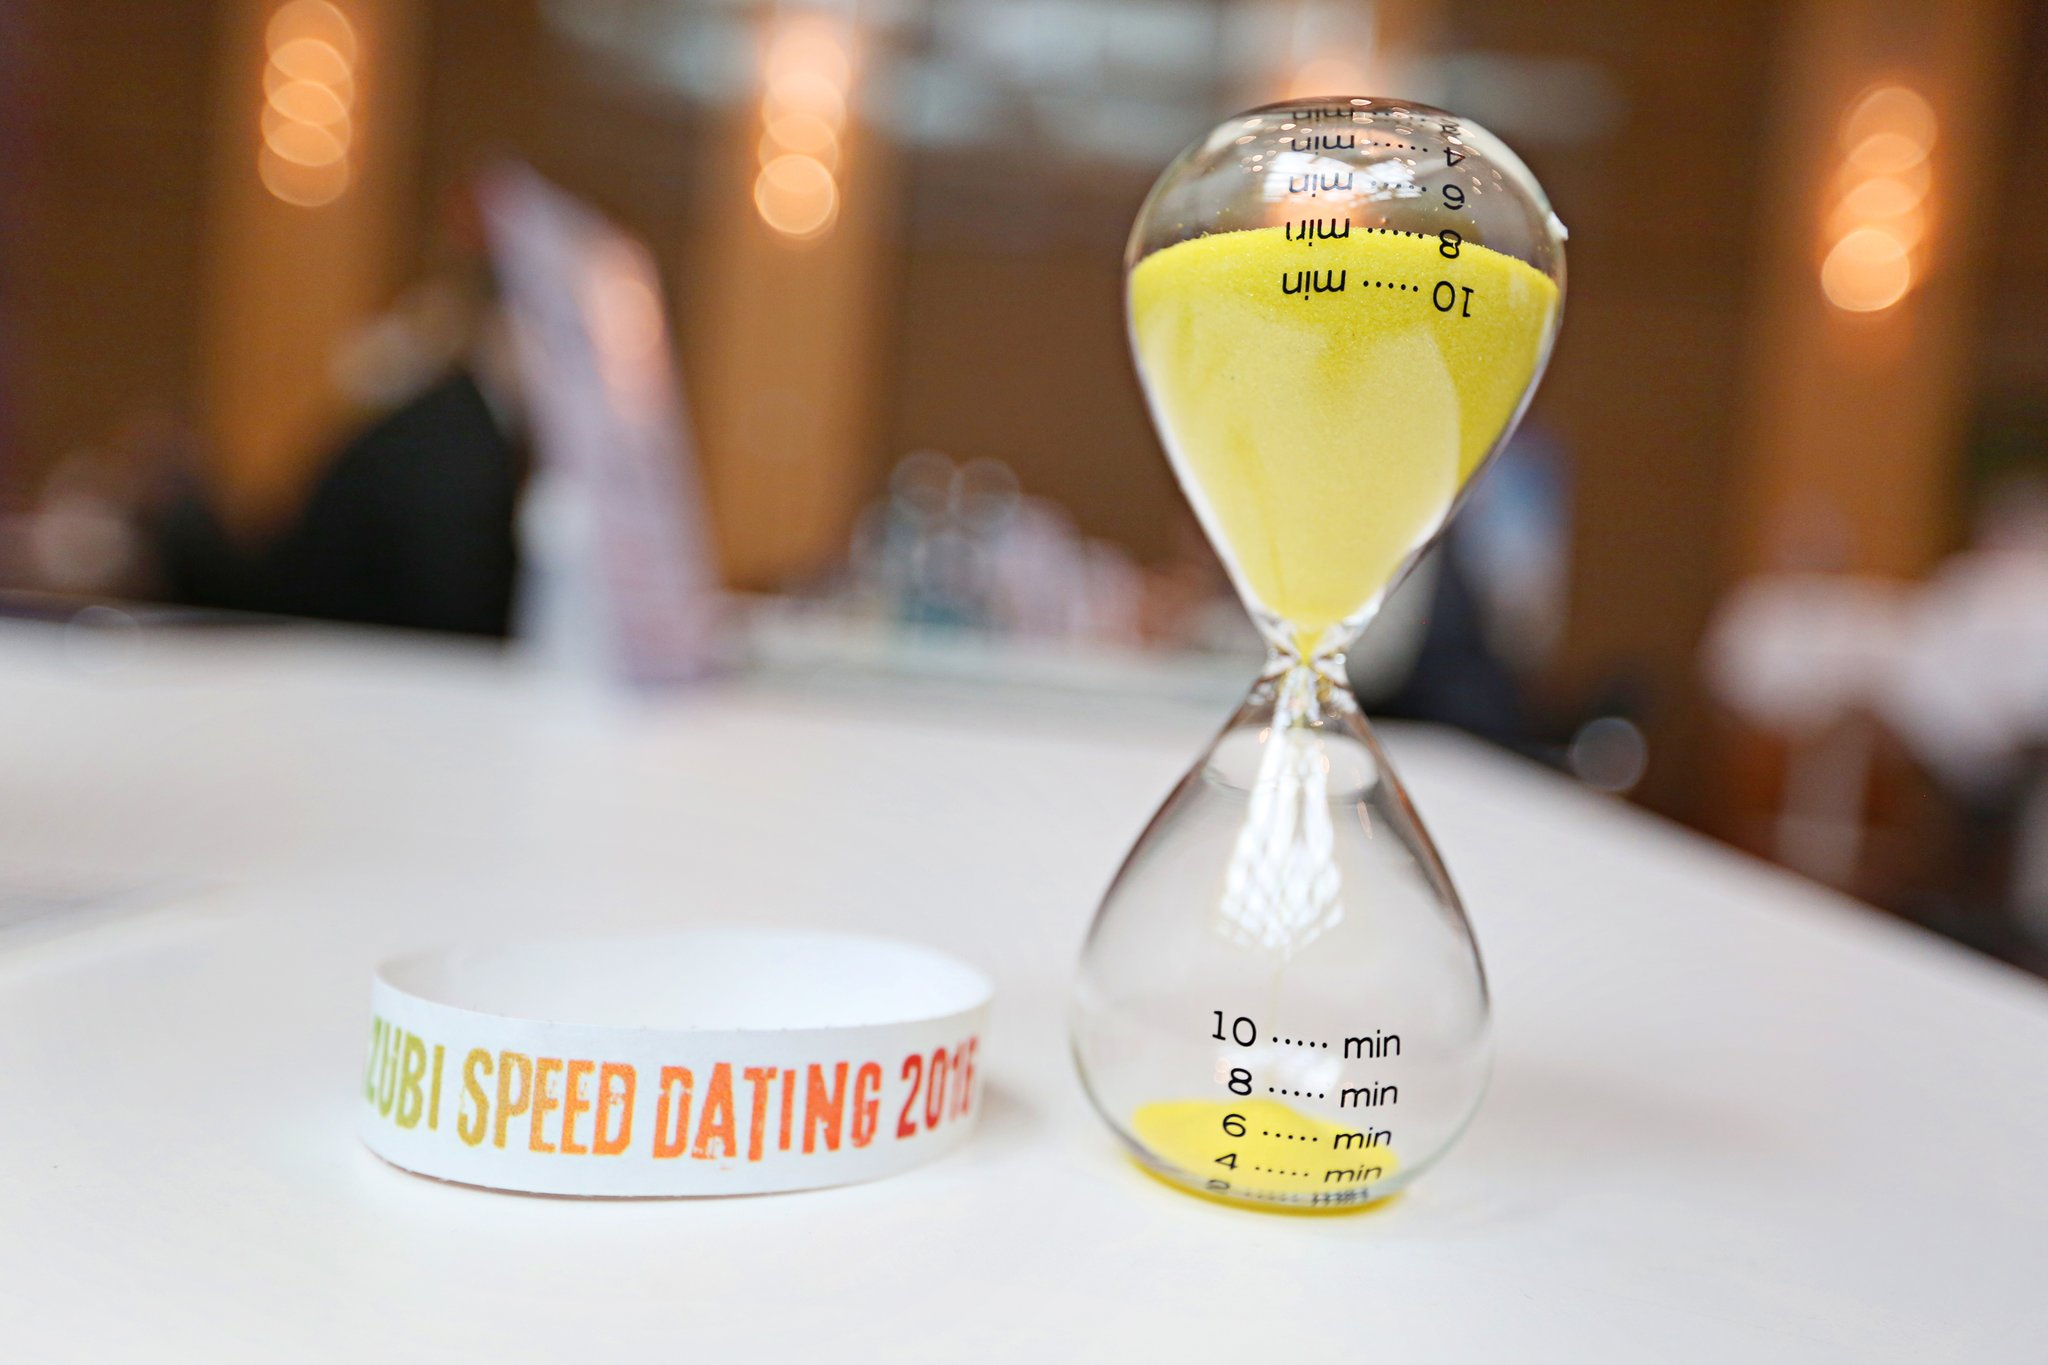 Speed dating düsseldorf